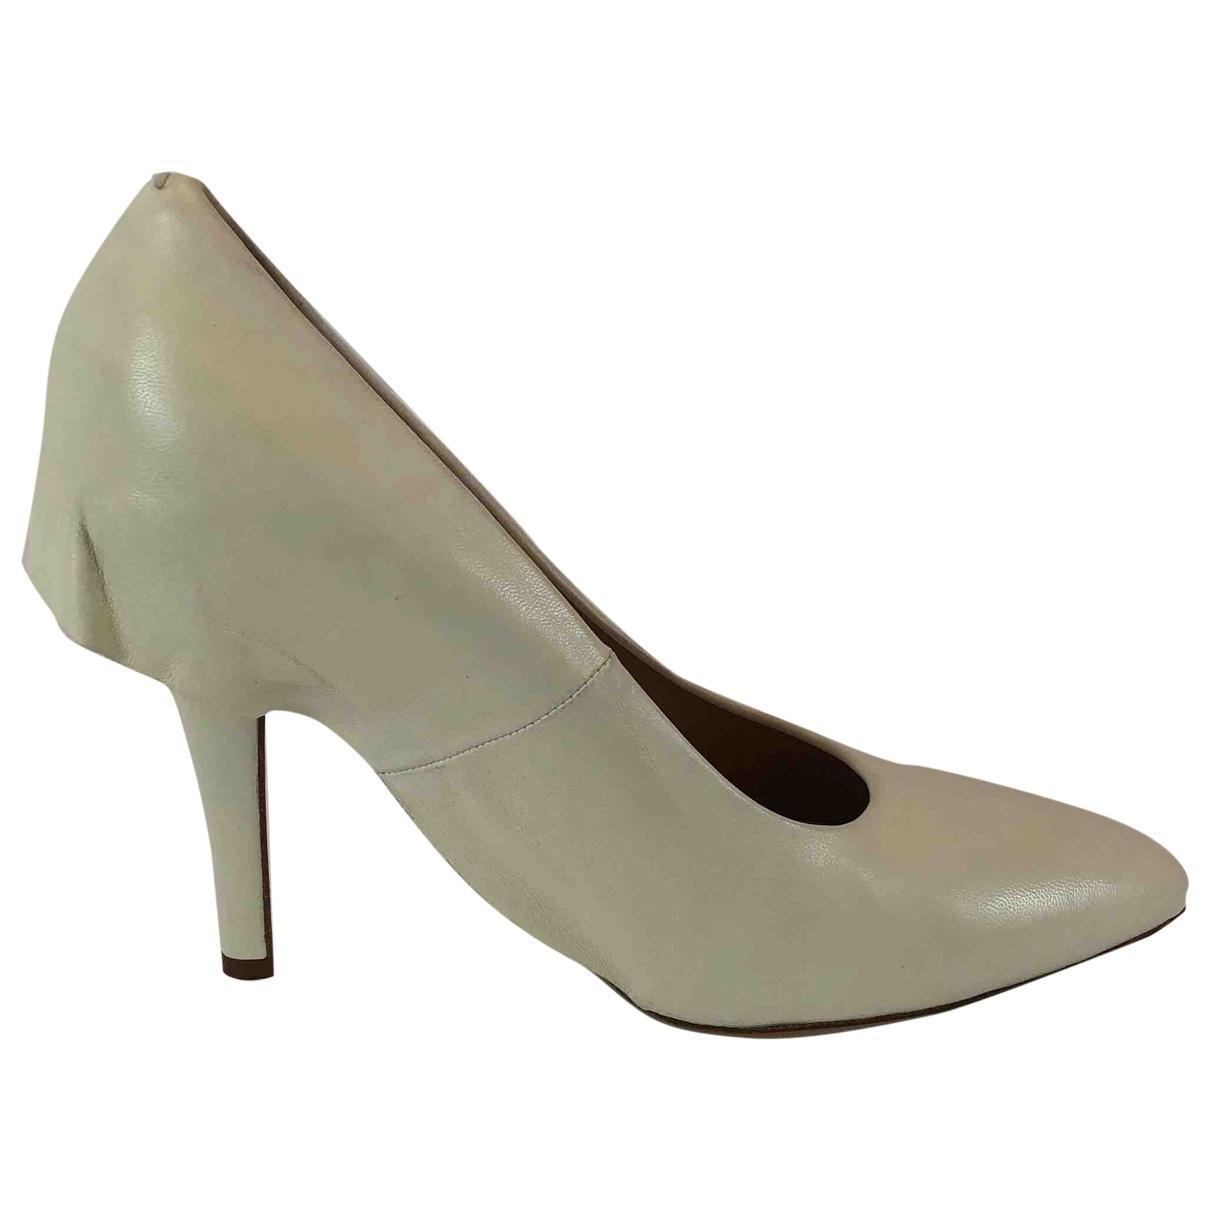 Maison Martin Margiela \N White Leather Heels for Women 39.5 EU